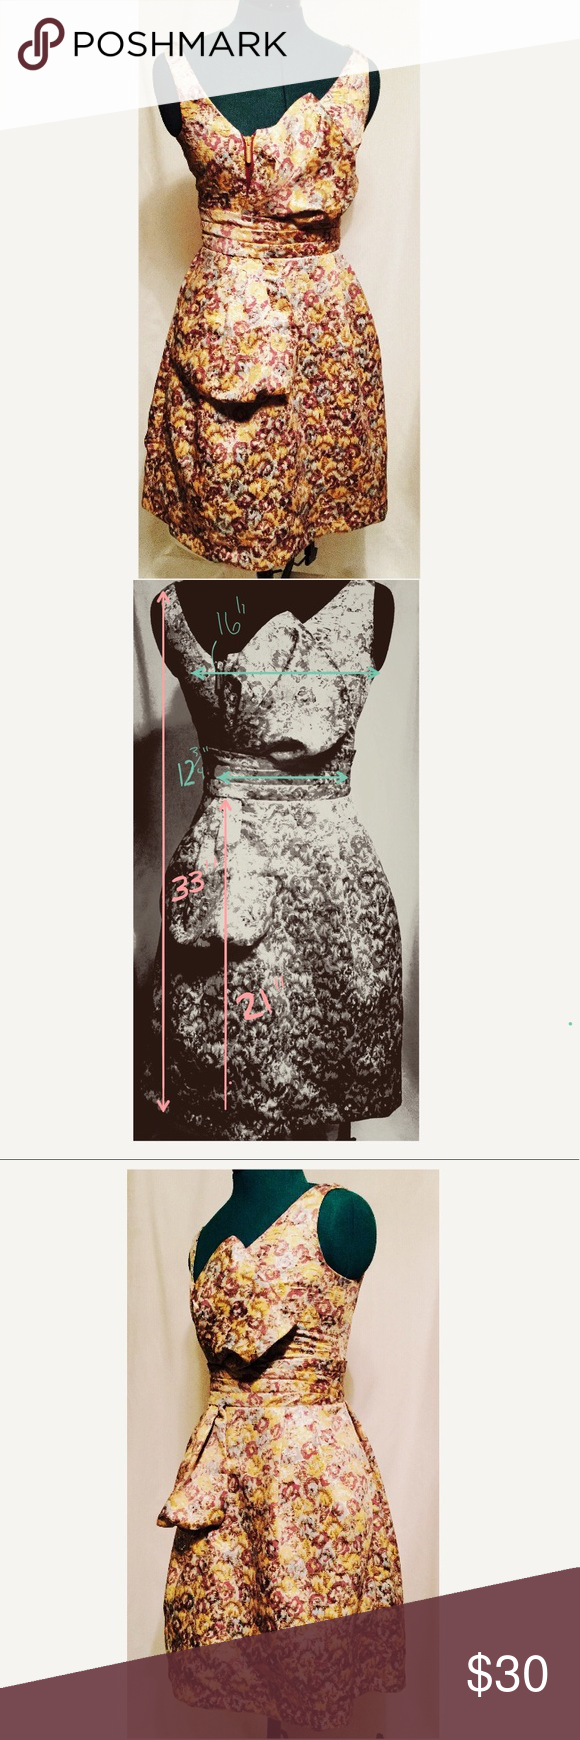 Zac Posen For Target Gold Formal Dress Size 1 Xs Gold Formal Dress Formal Dresses Dresses [ 1740 x 580 Pixel ]